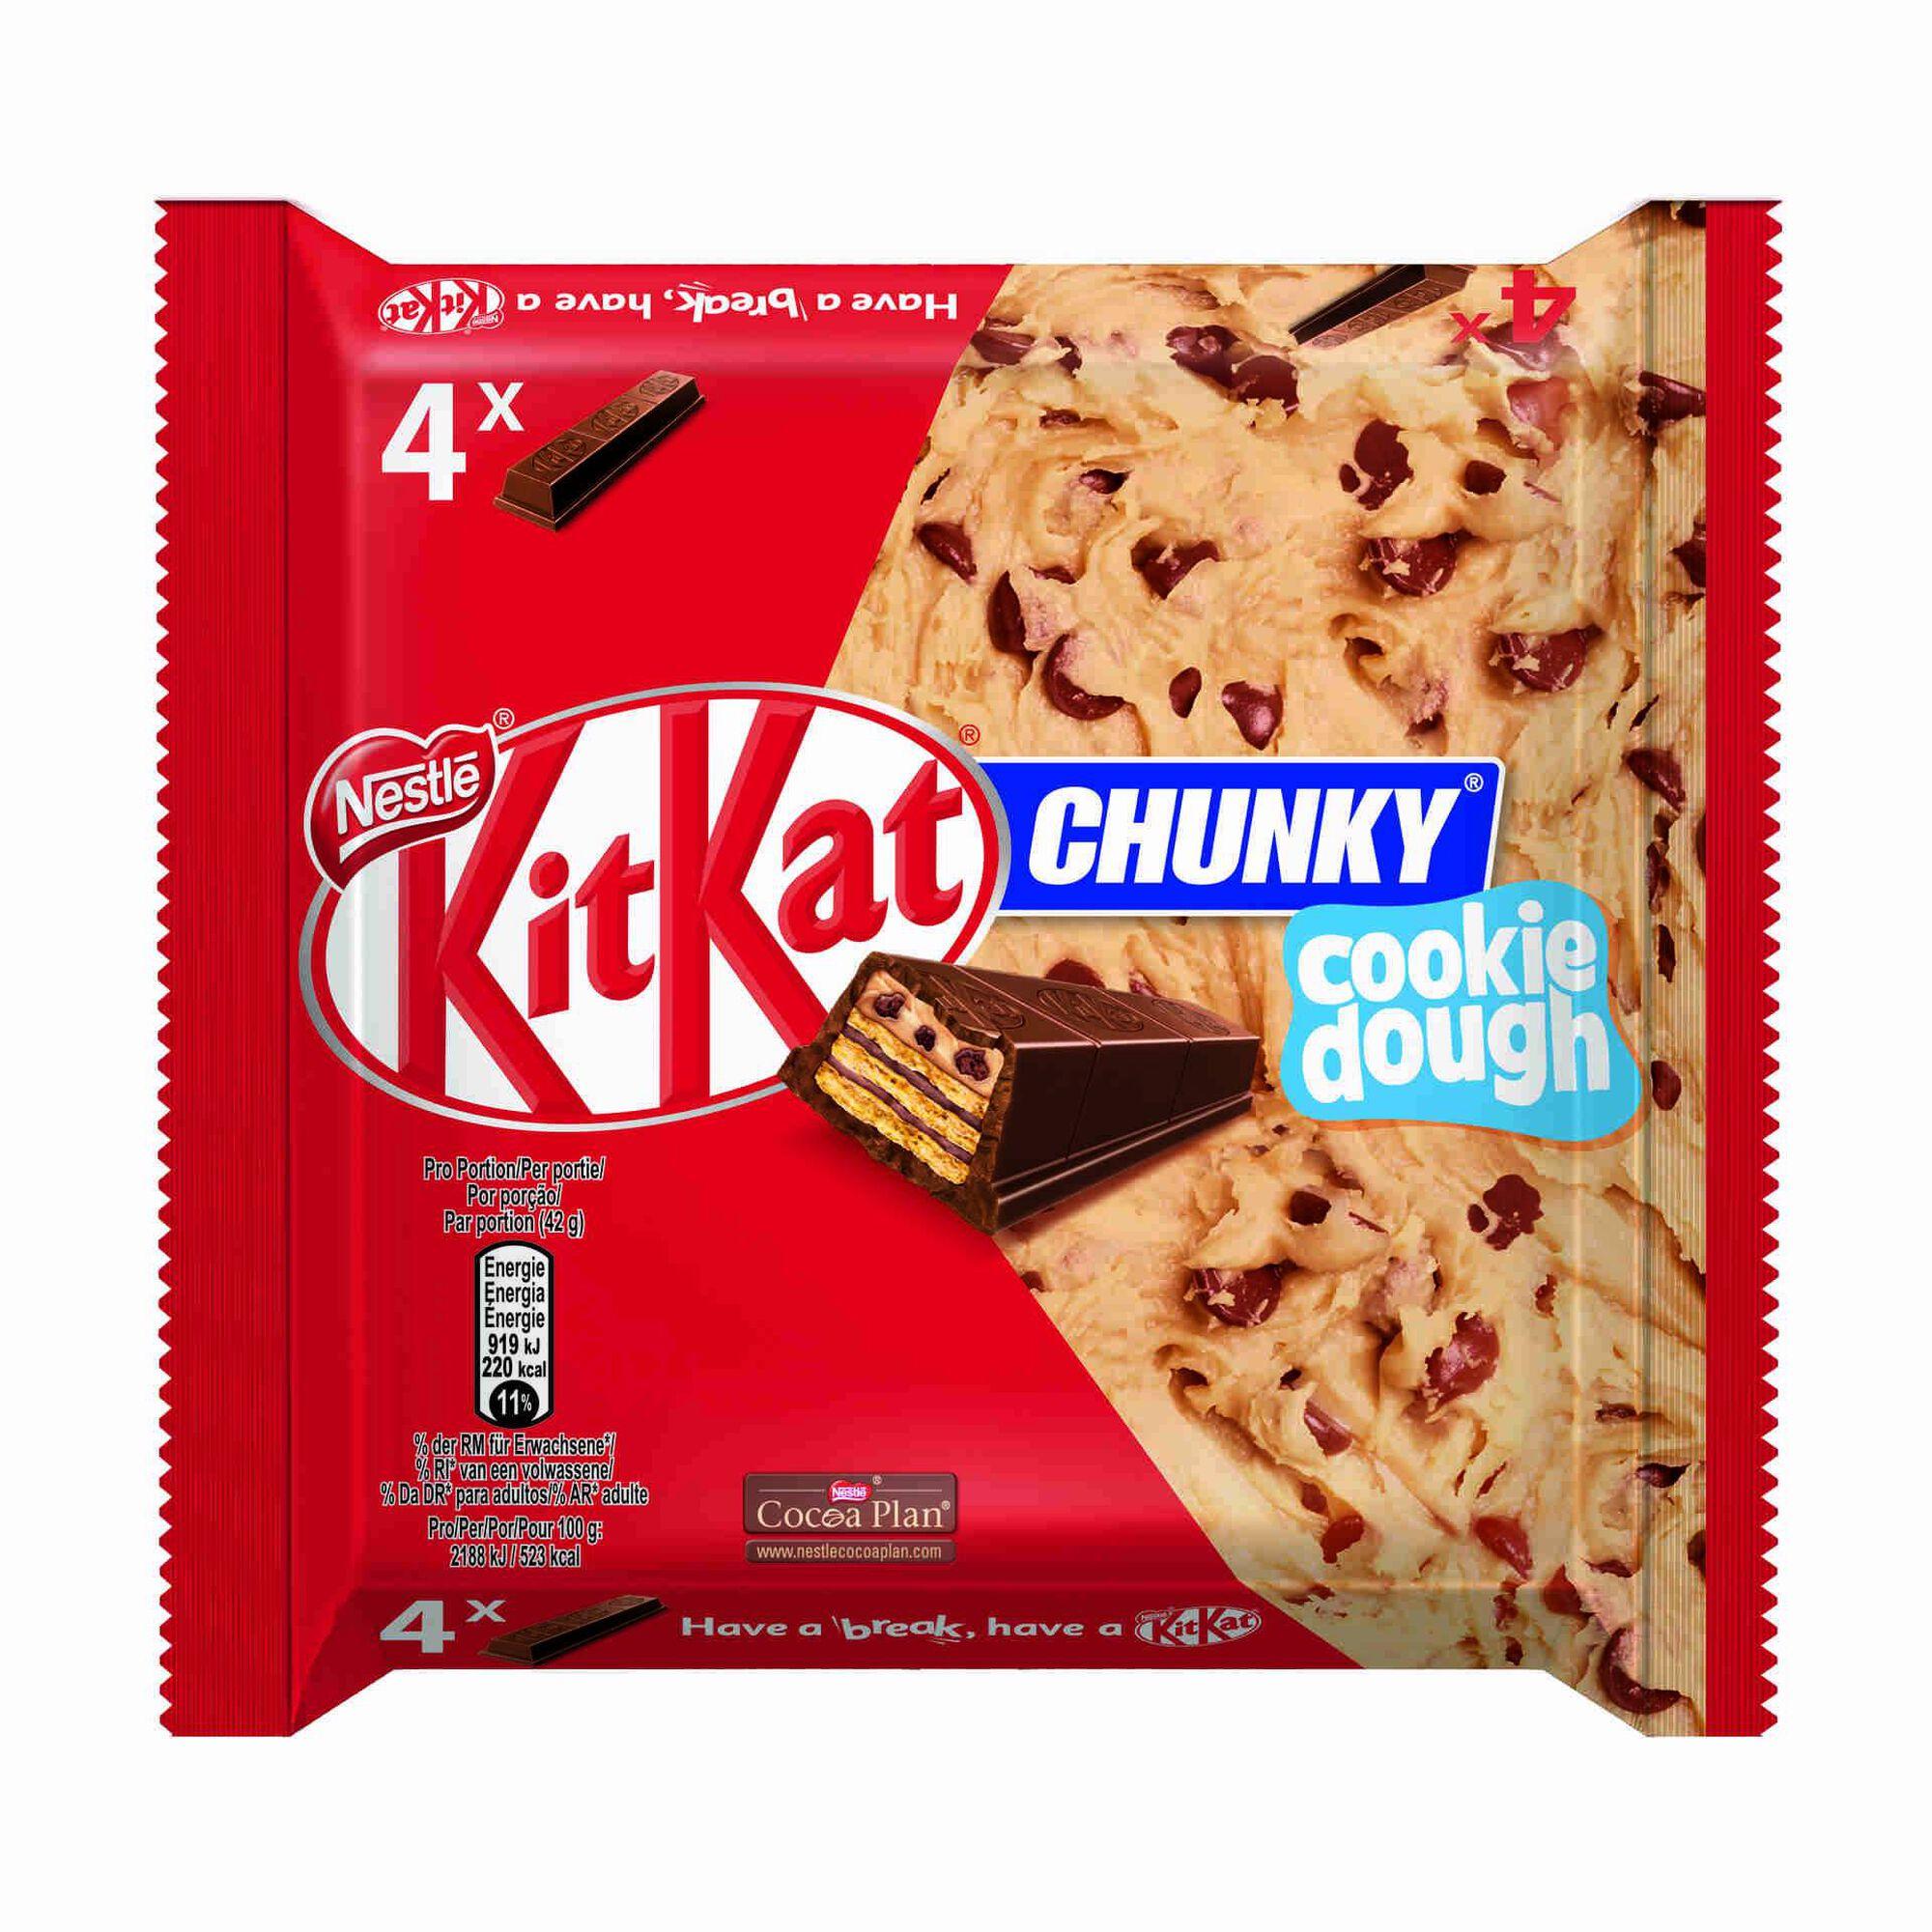 Snack de Chocolate KitKat Chunky Cookie Dough